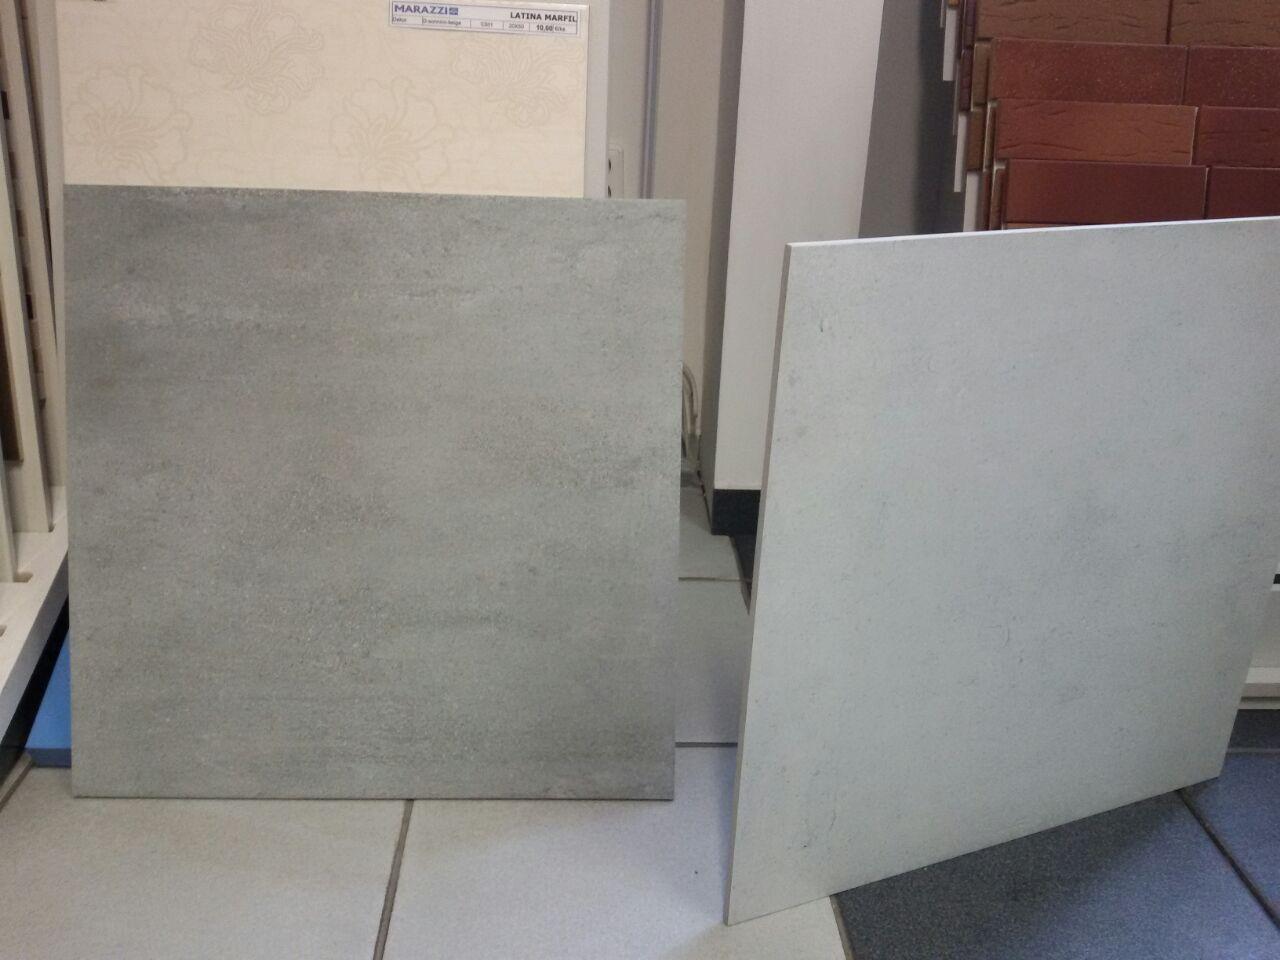 InTeRiEr -  ExTeRiEr - Dlazba do kupelne a WC - RAKO Cemento 60x60 - ta tmava nalavo. Kombinovana bude s obkladom Rako bielou lesklou 30x60.